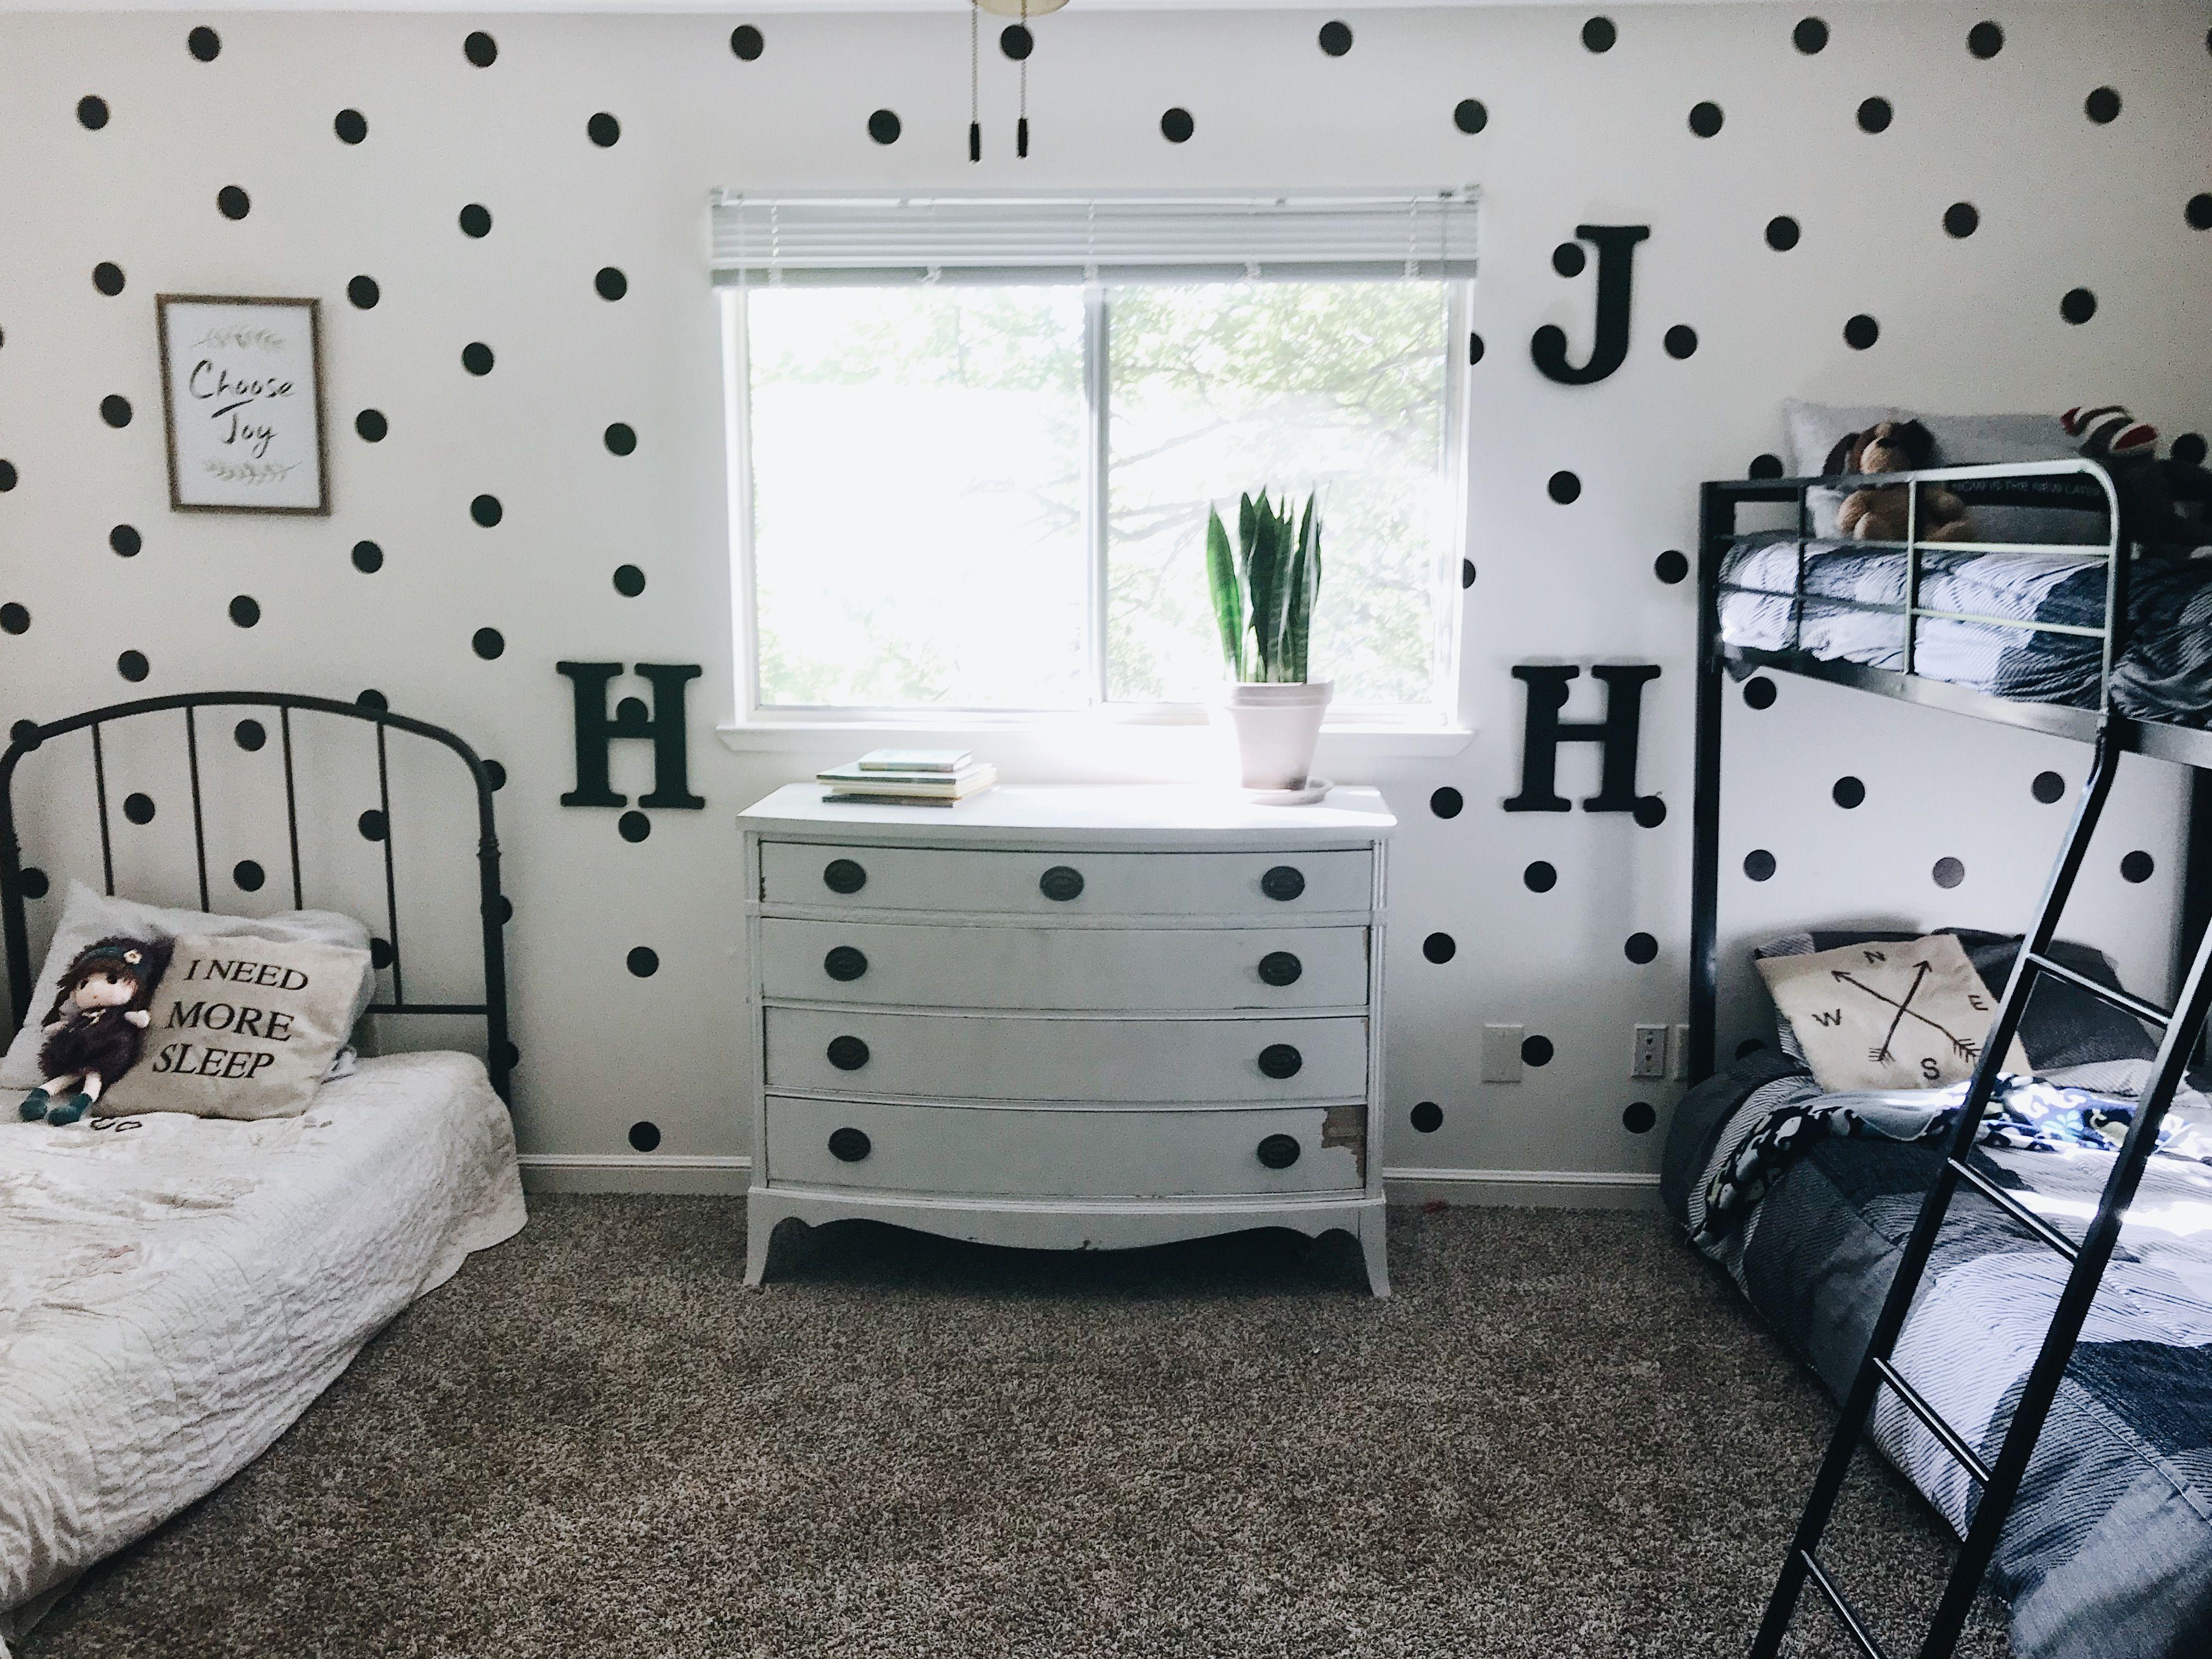 Shared Kid S Room Diy Polka Dot Wall With Brewster Home Kimilove Kids Room Wallpaper Ikea Hack Kids Room Modern Kids Room